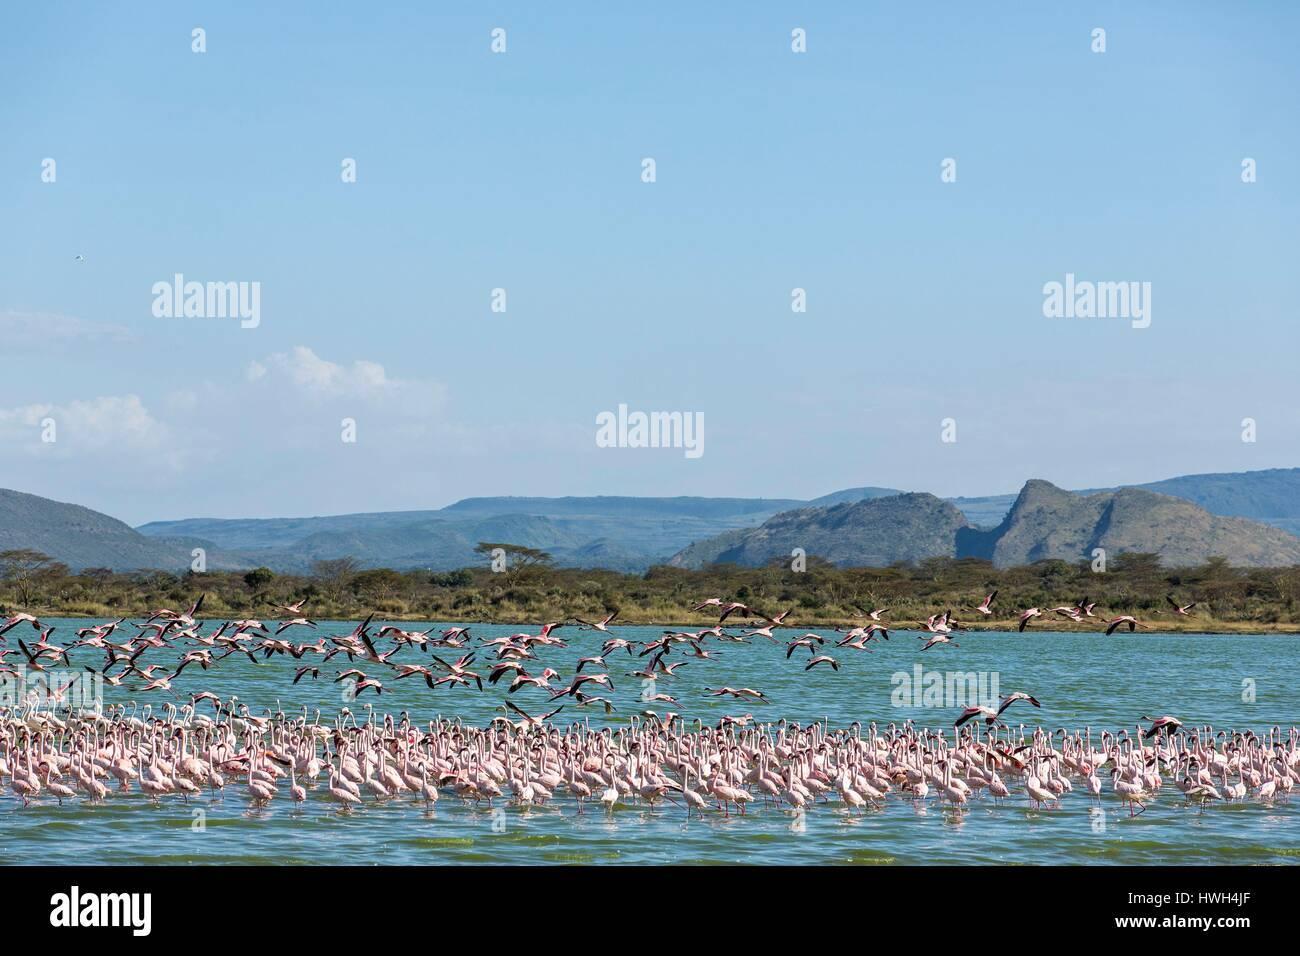 Kenya, Soysambu conservancy, lesser flamingo (Phoeniconaias minor), on the lake Elementeita Stock Photo